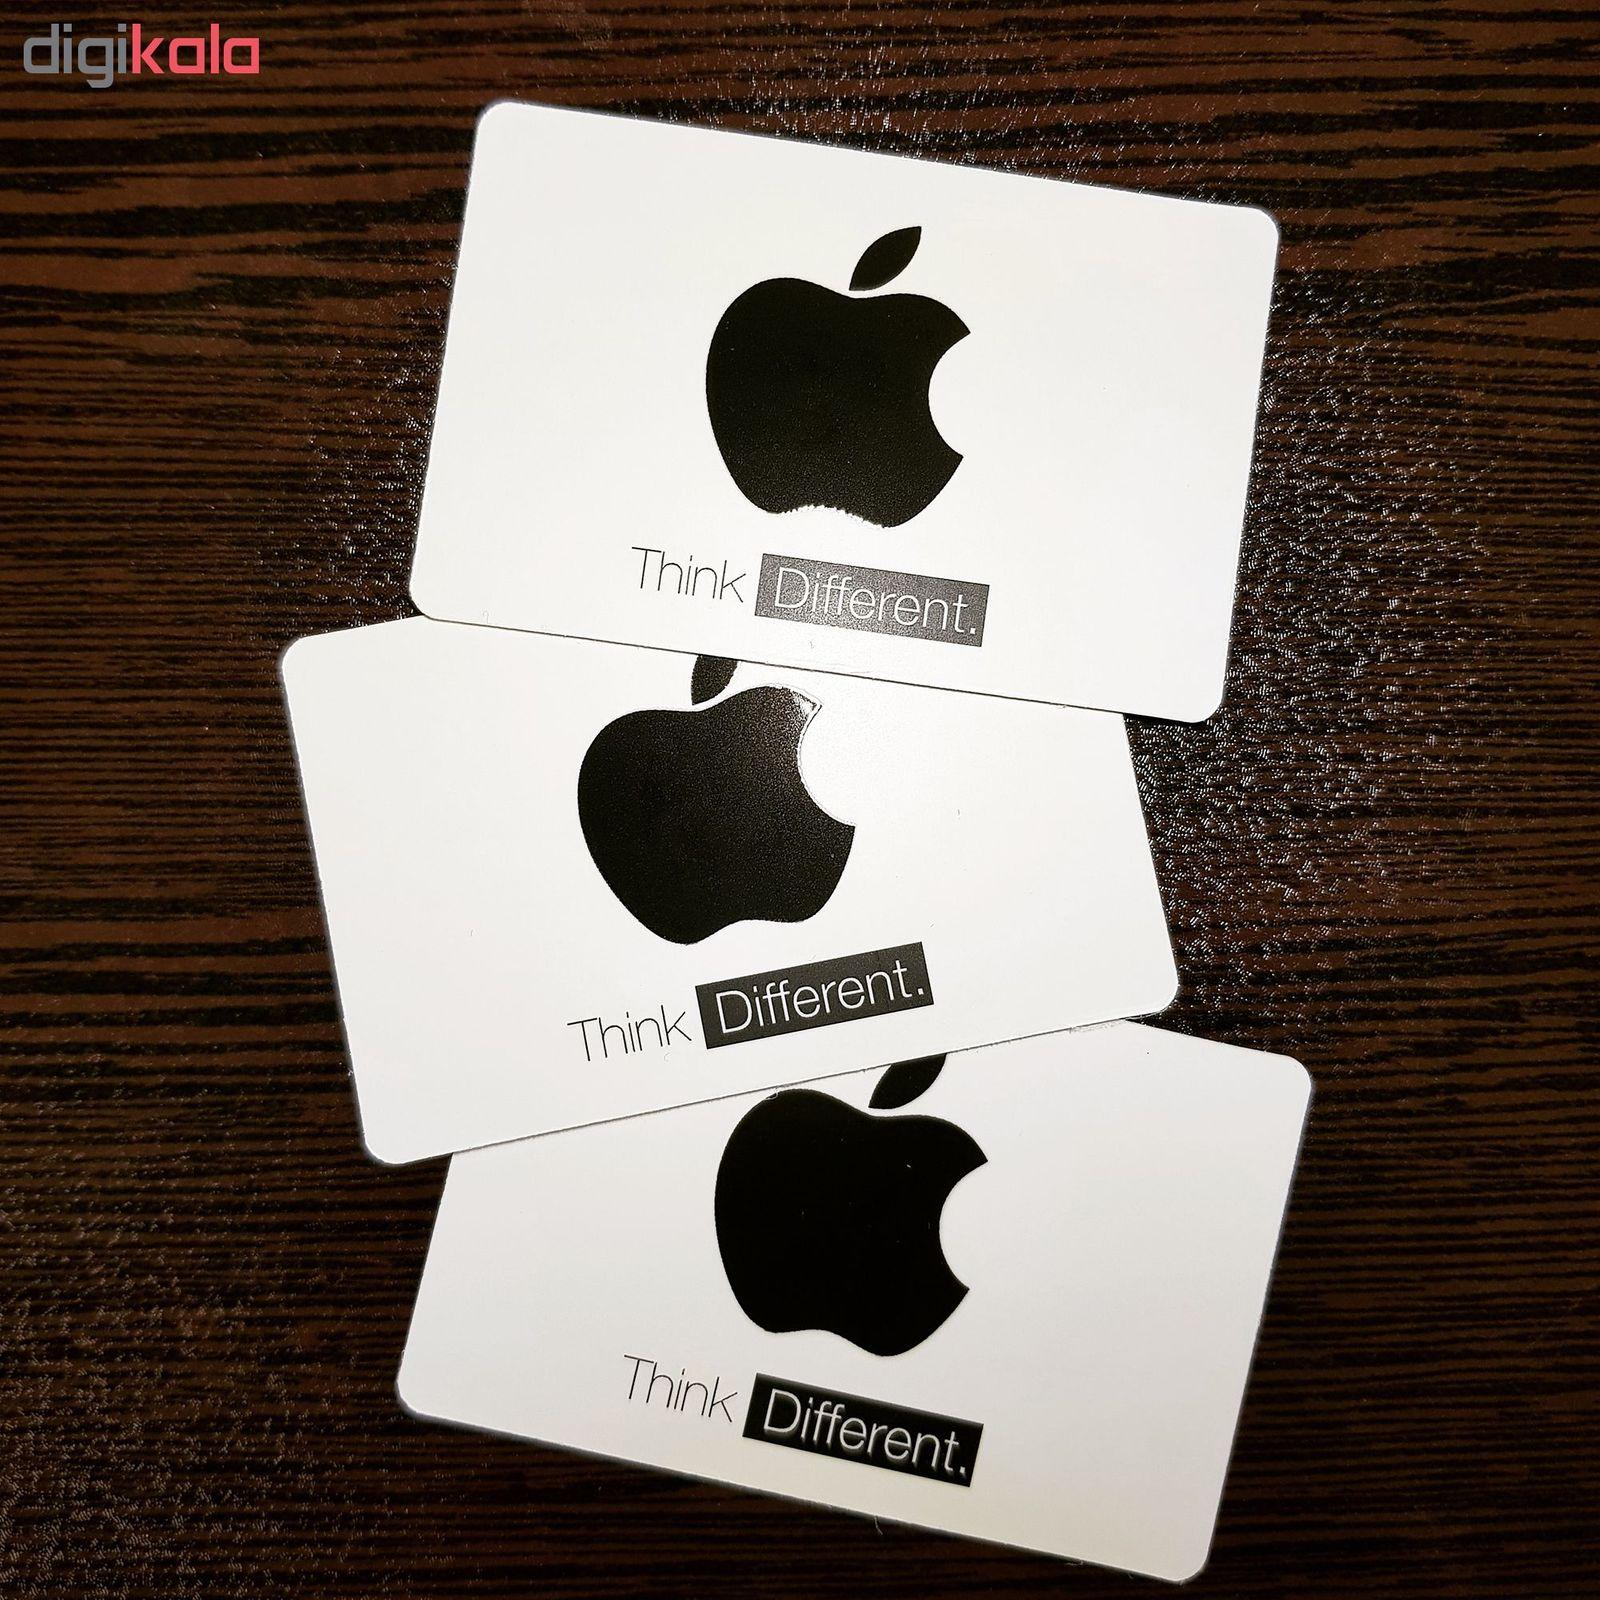 اپل آیدی بدون اعتبار اولیه مدل STK thumb 2 1